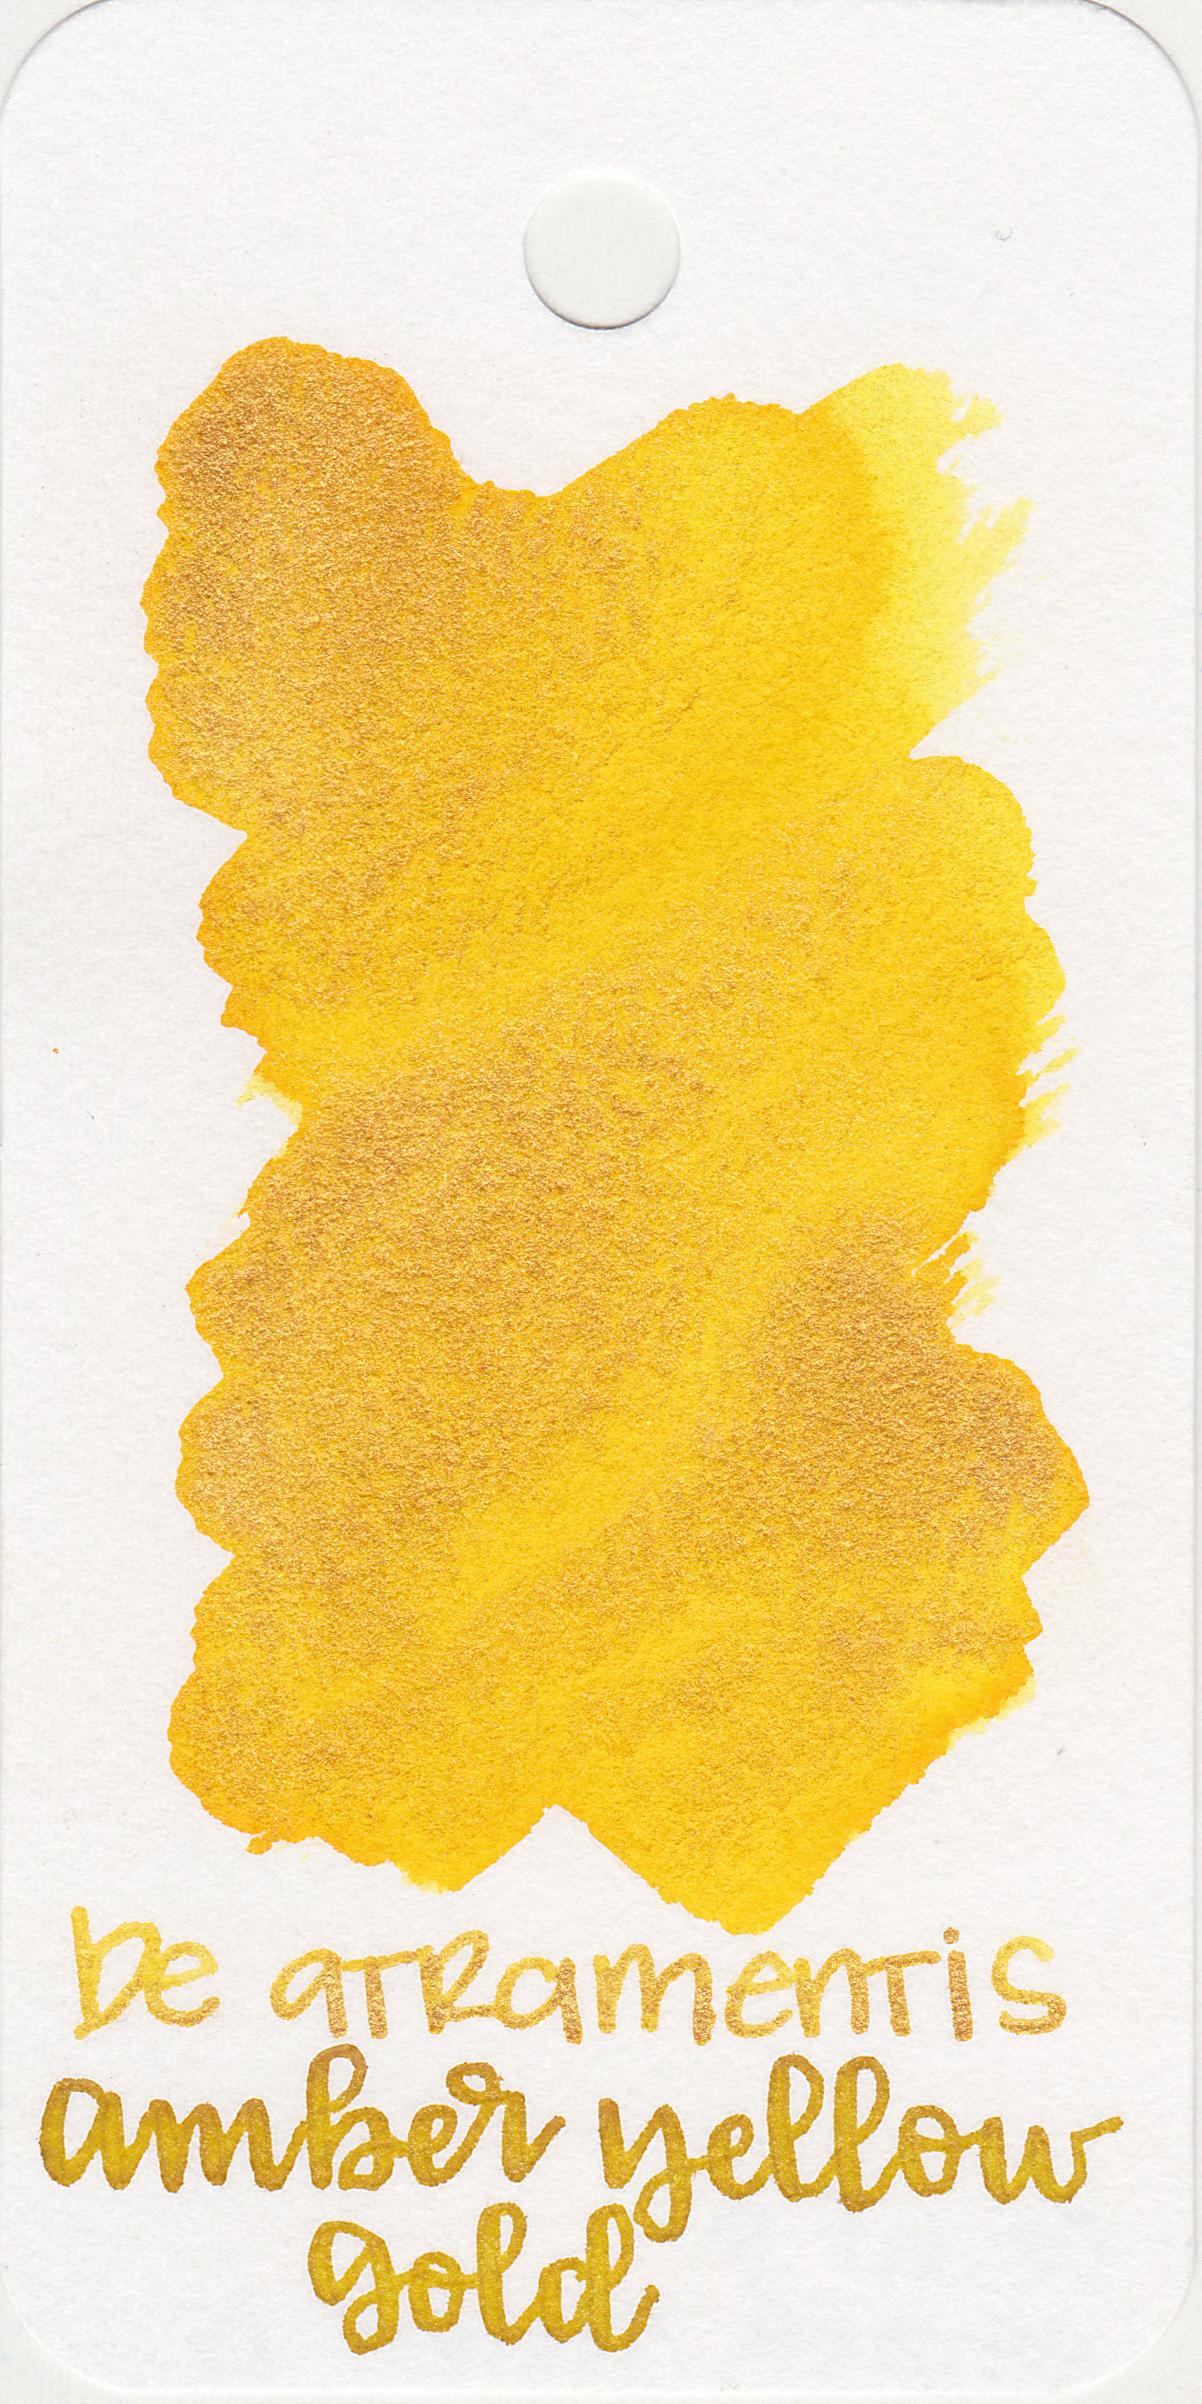 da-amber-yellow-gold-1.jpg